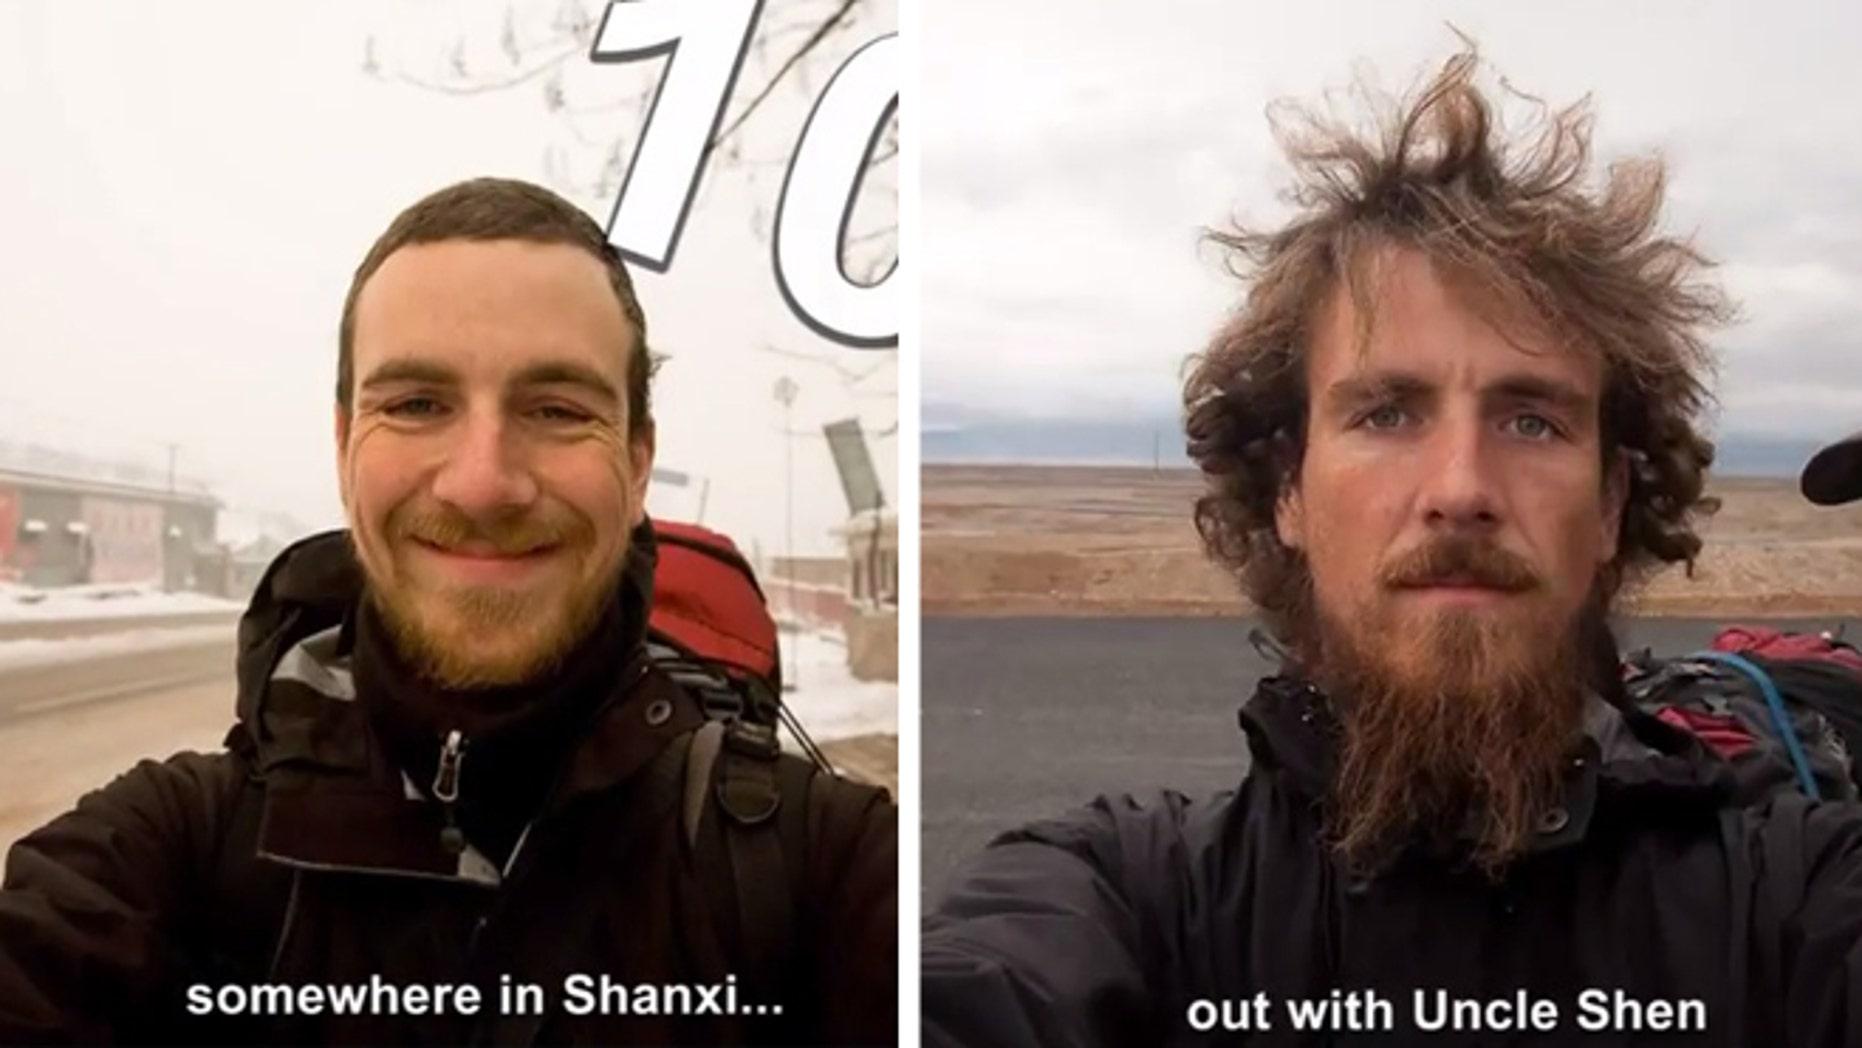 An epic transformation during one man's 2,800 mile trek.